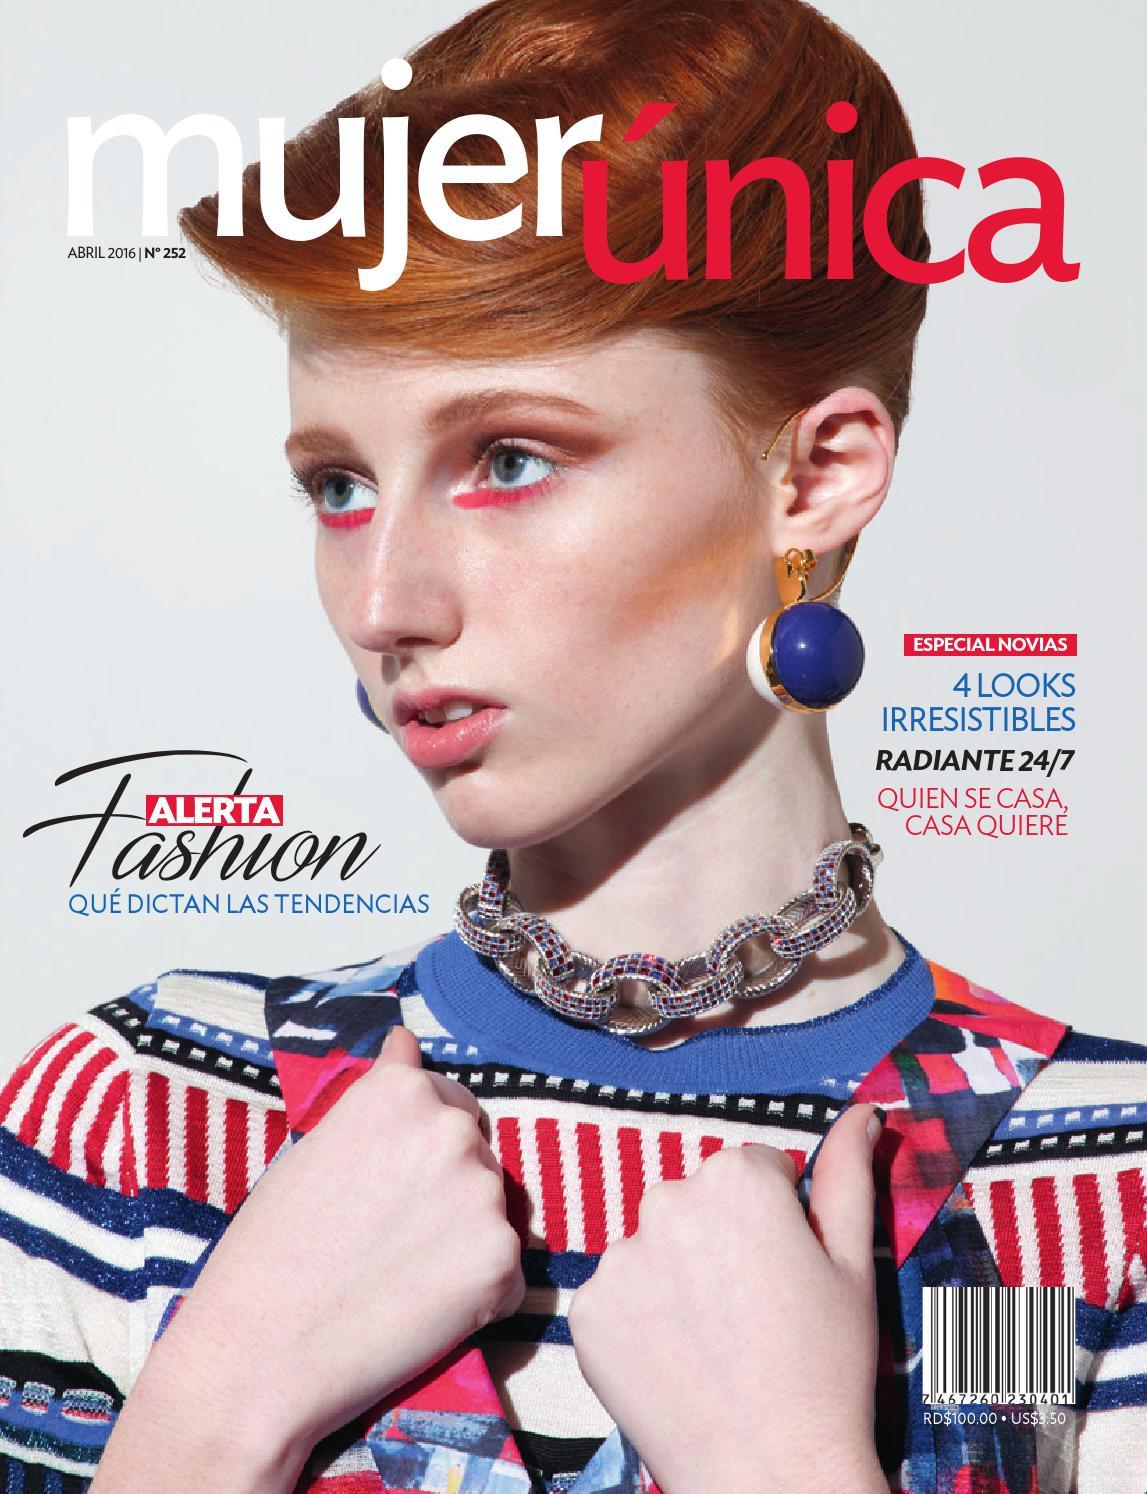 Unica 252 by Grupo Diario Libre, S. A. - issuu